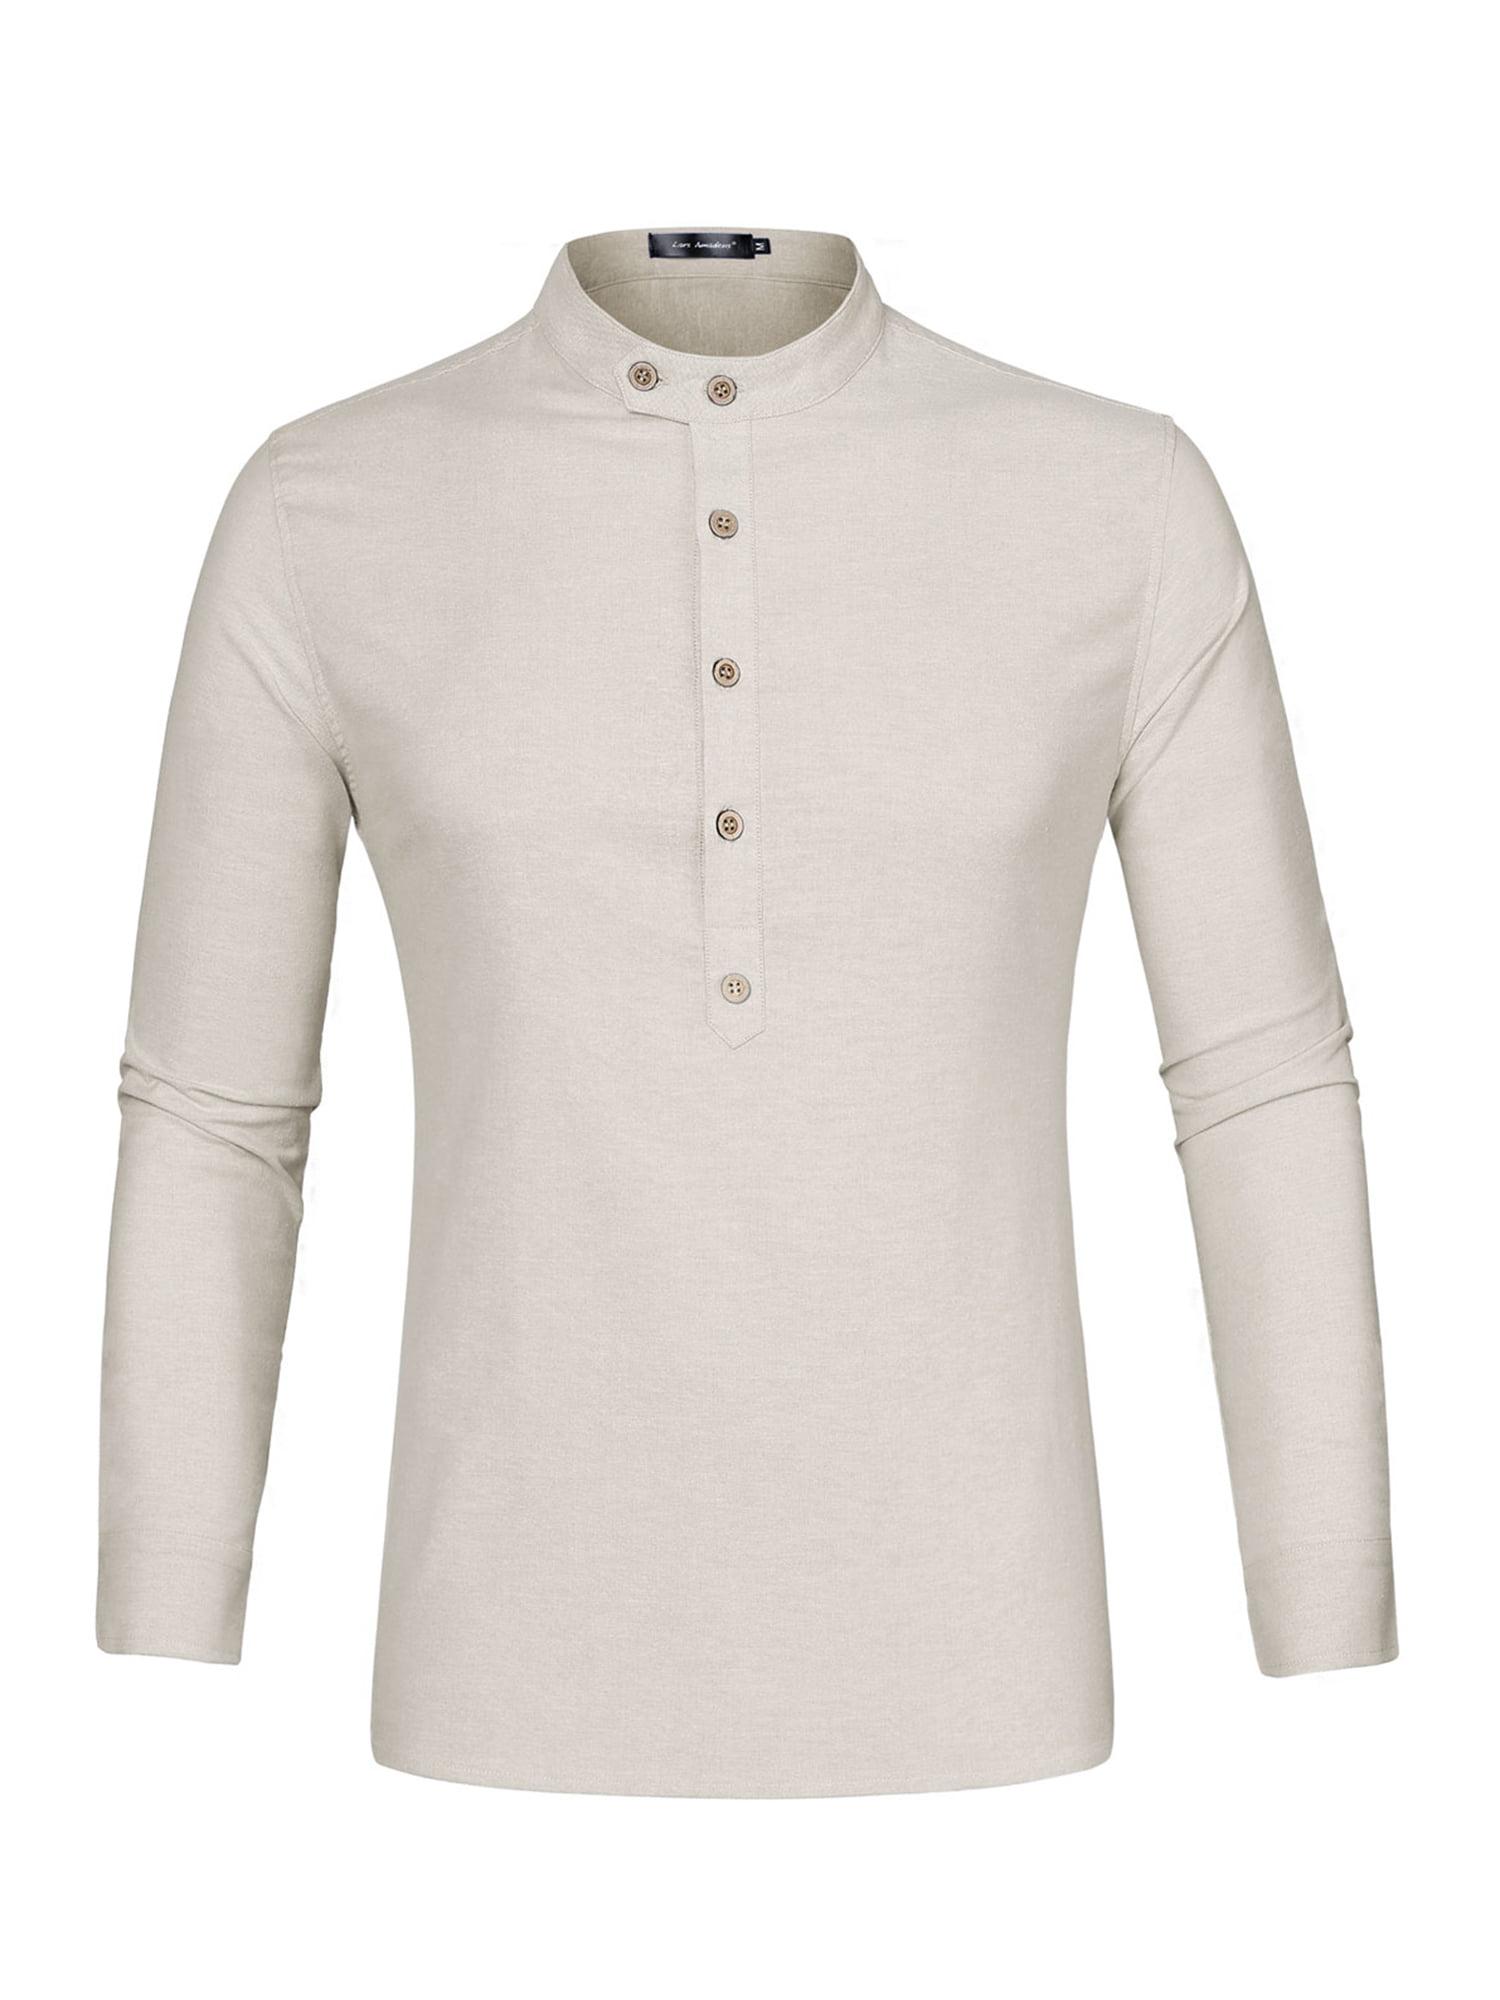 Details about  /True Blue Men Solid Mandarin Collar Long Sleeve Slim Fit Beige Shirt